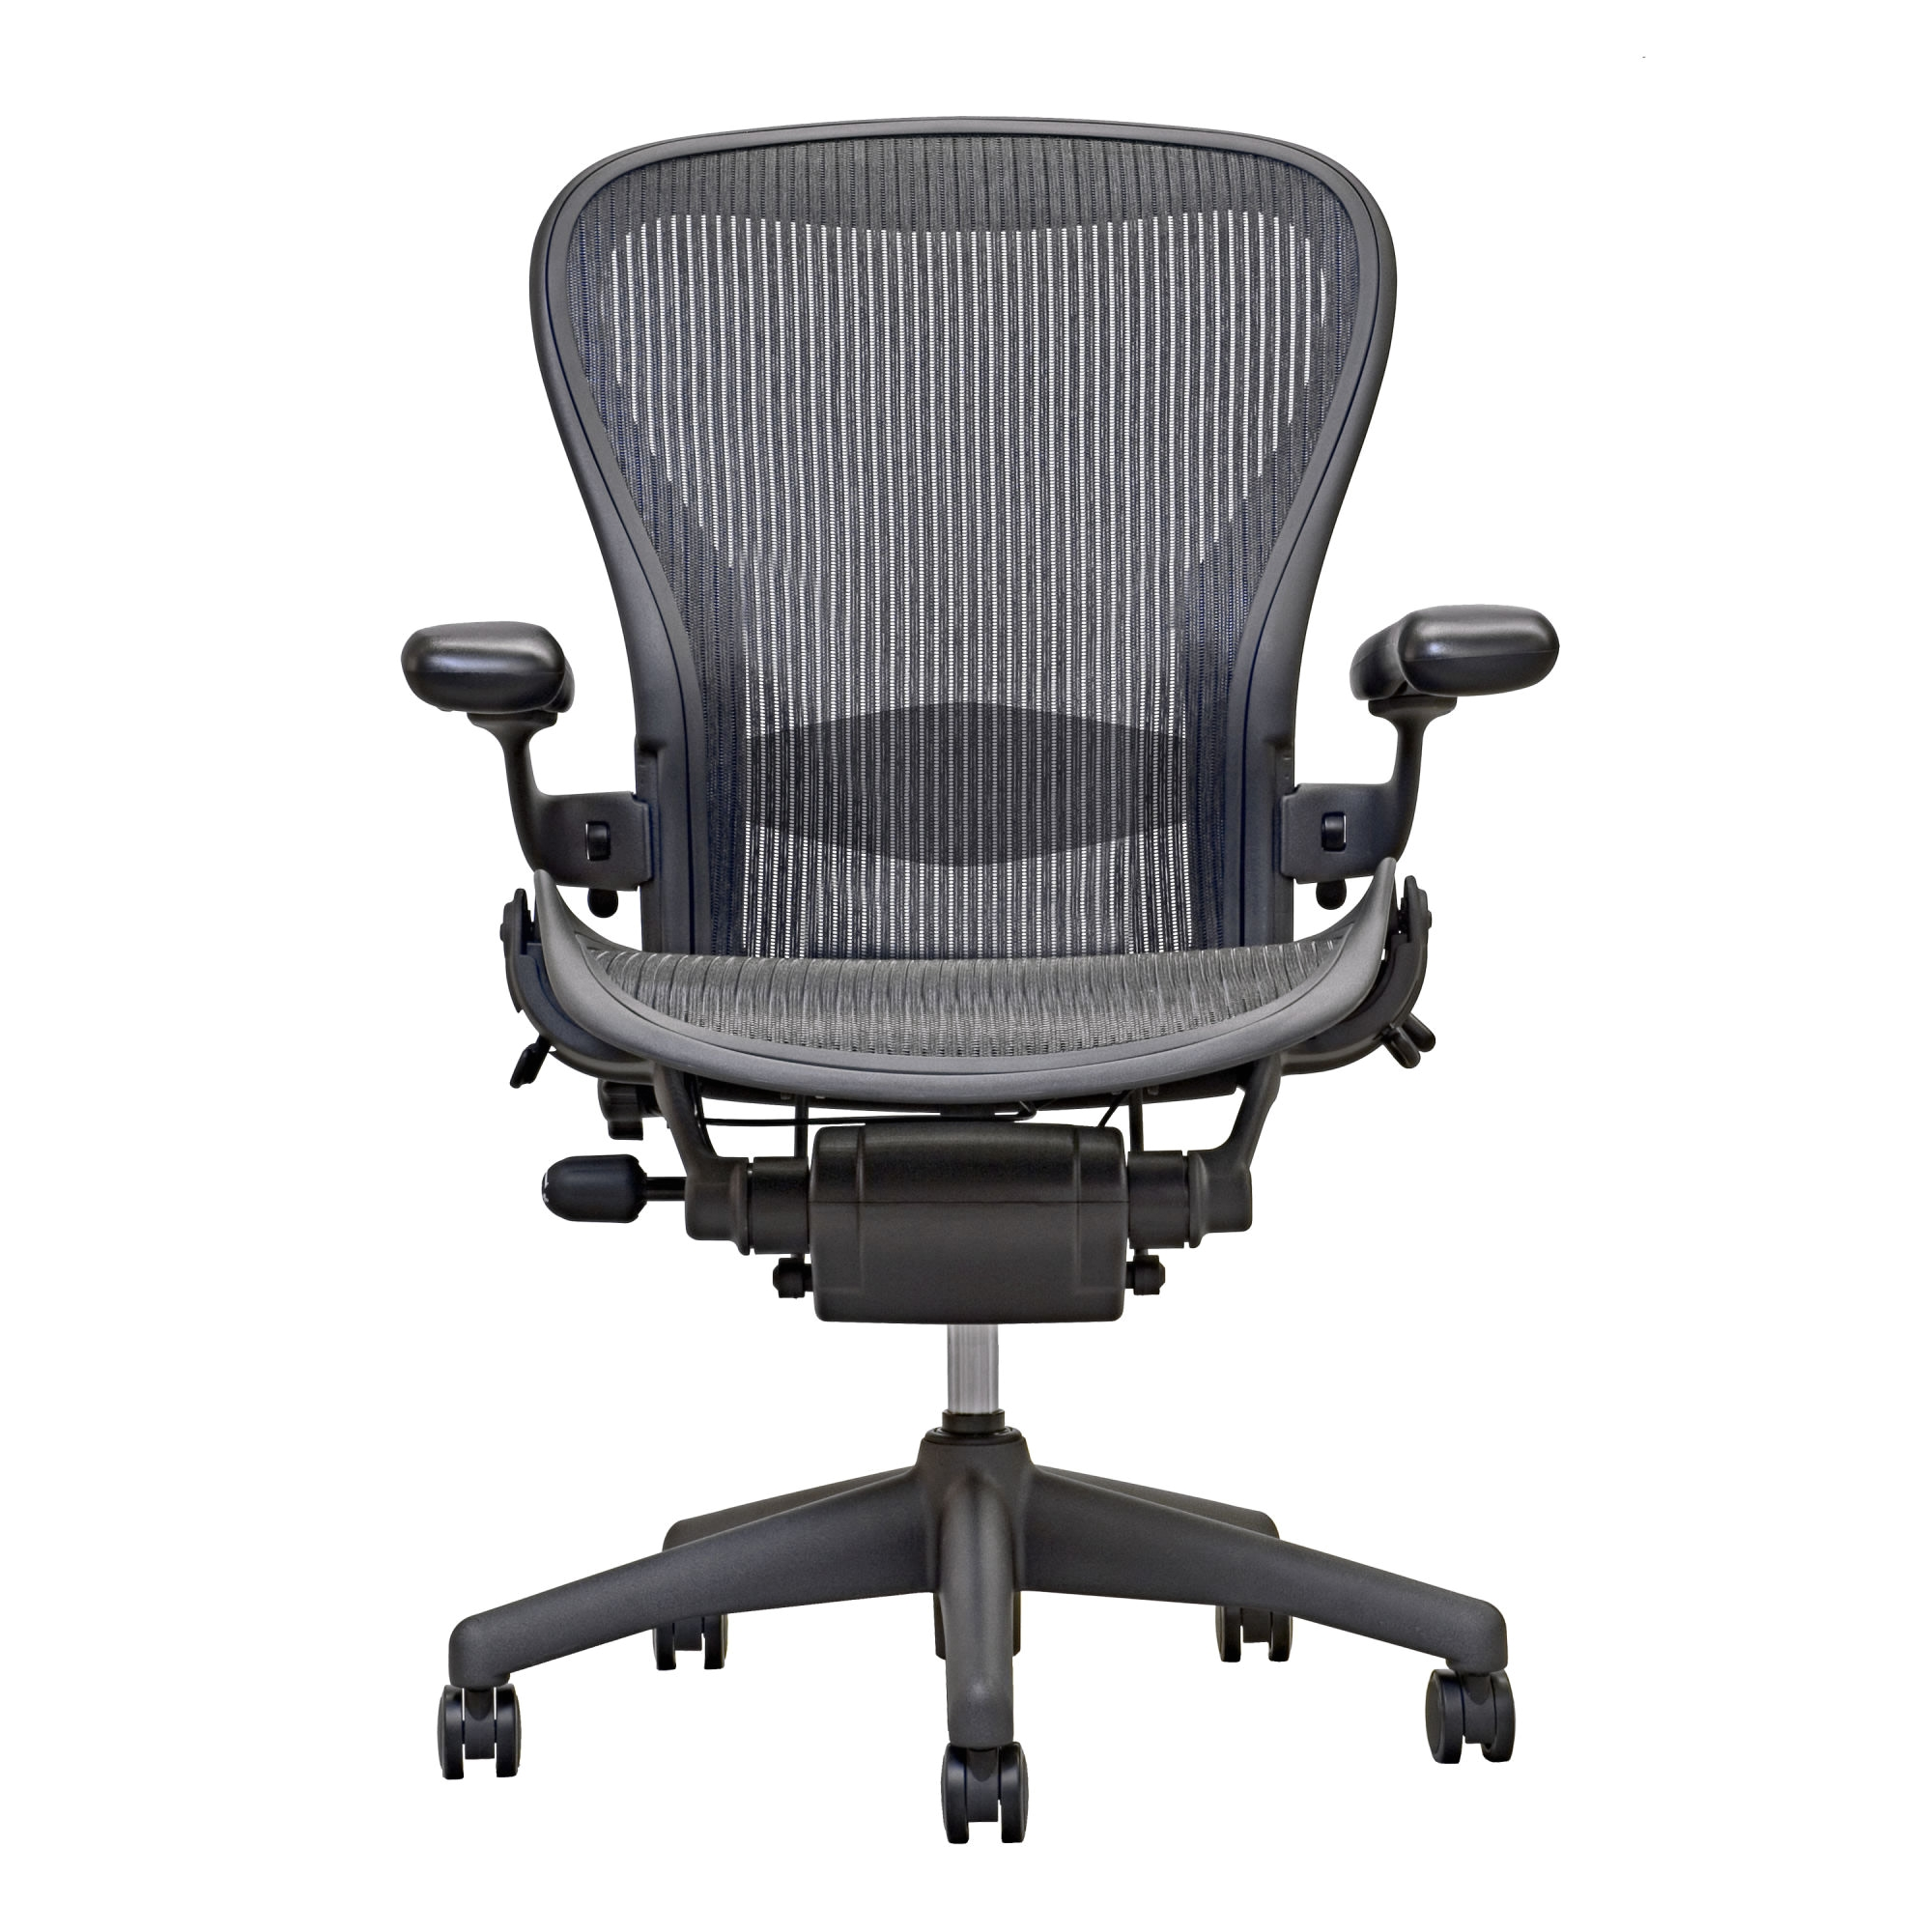 Herman Miller Aeron Chair Sizes A B C Aeron Chair by Herman Miller